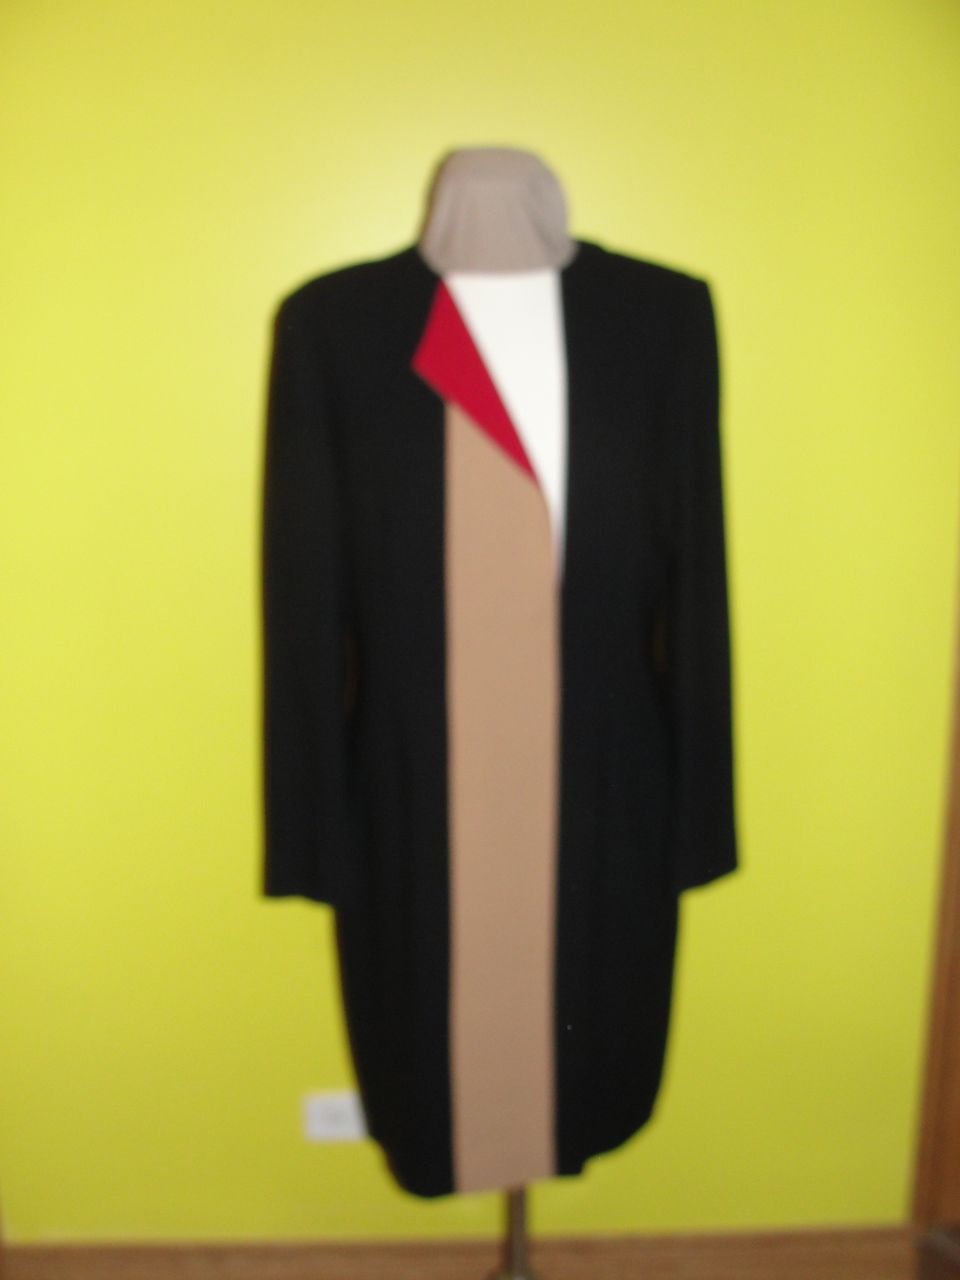 Liz Claiborn Black with Class Career Wear Dress